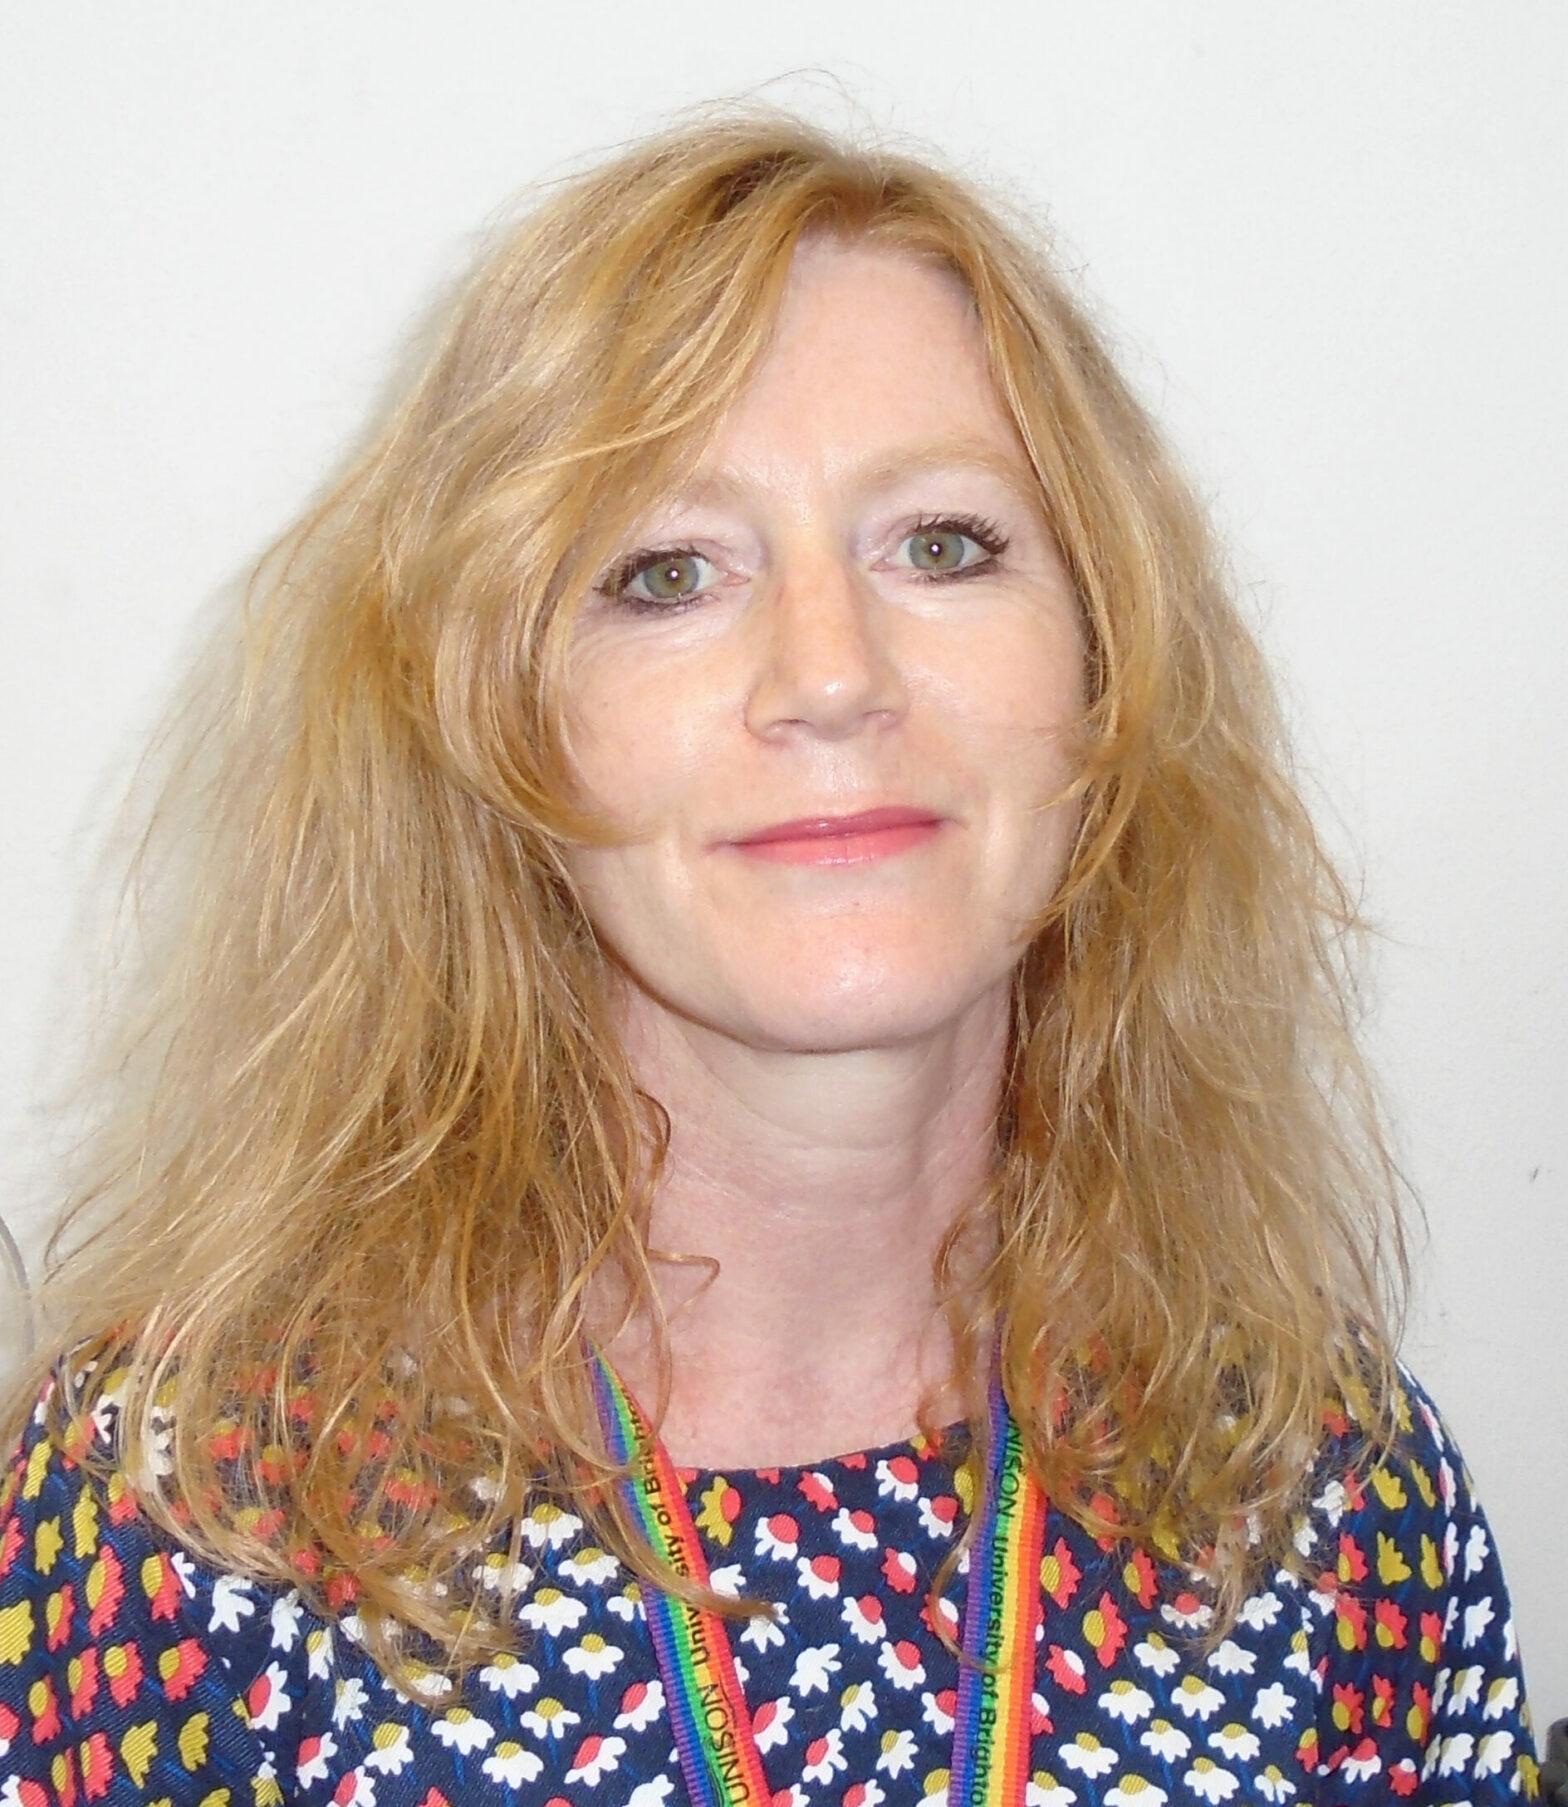 Zoe Webb